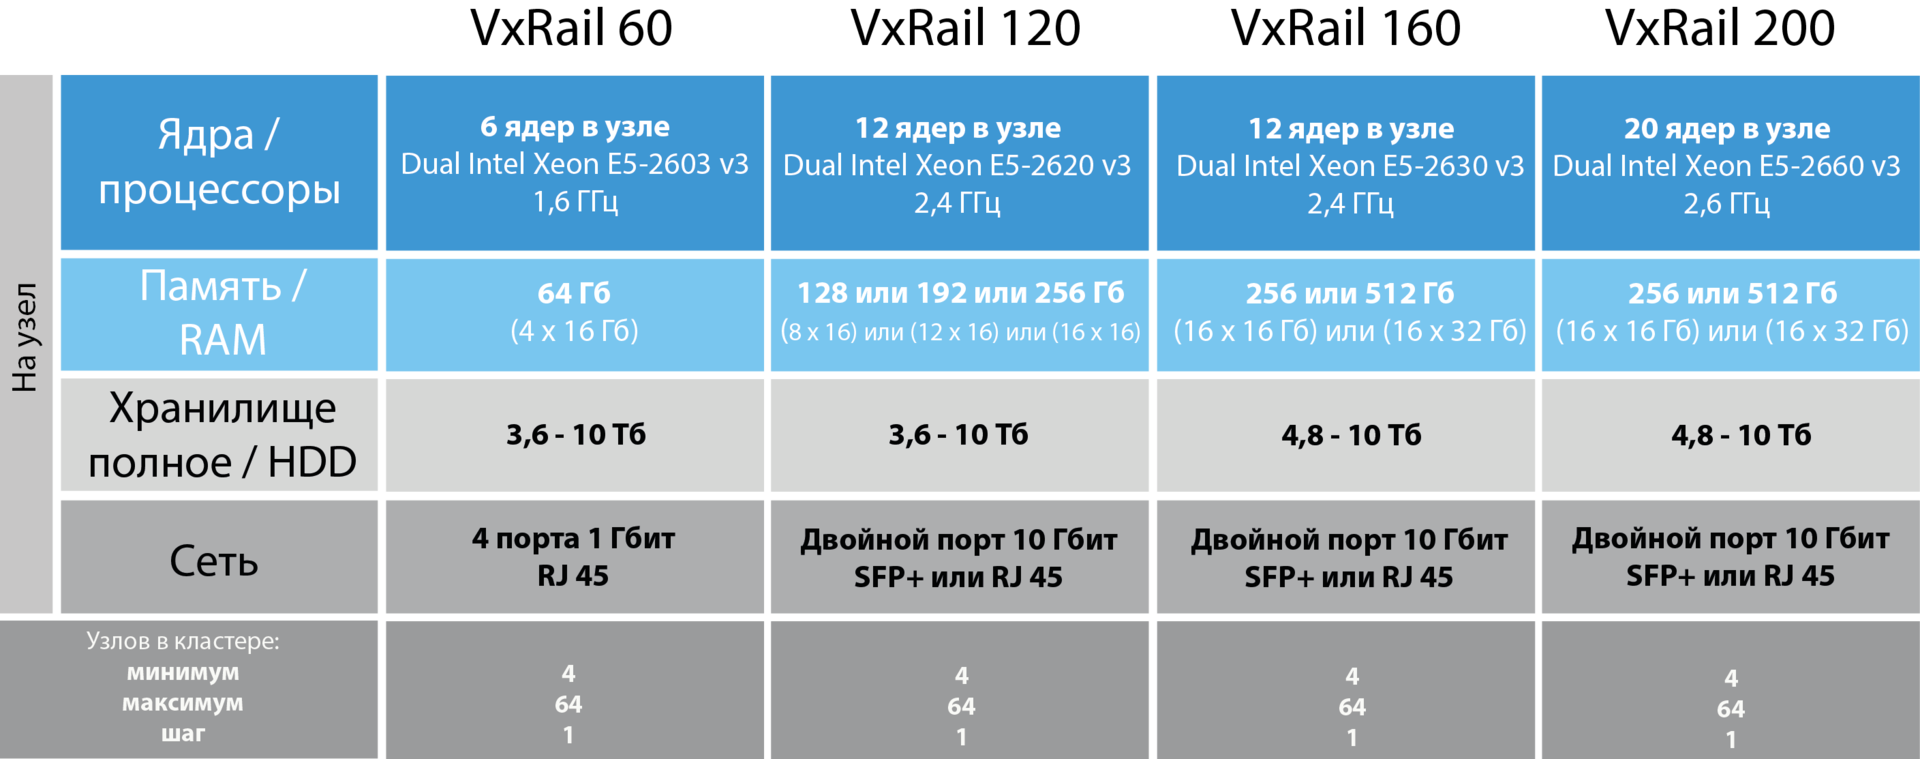 VxRail — гиперконвергентная СХД на все времена - 7